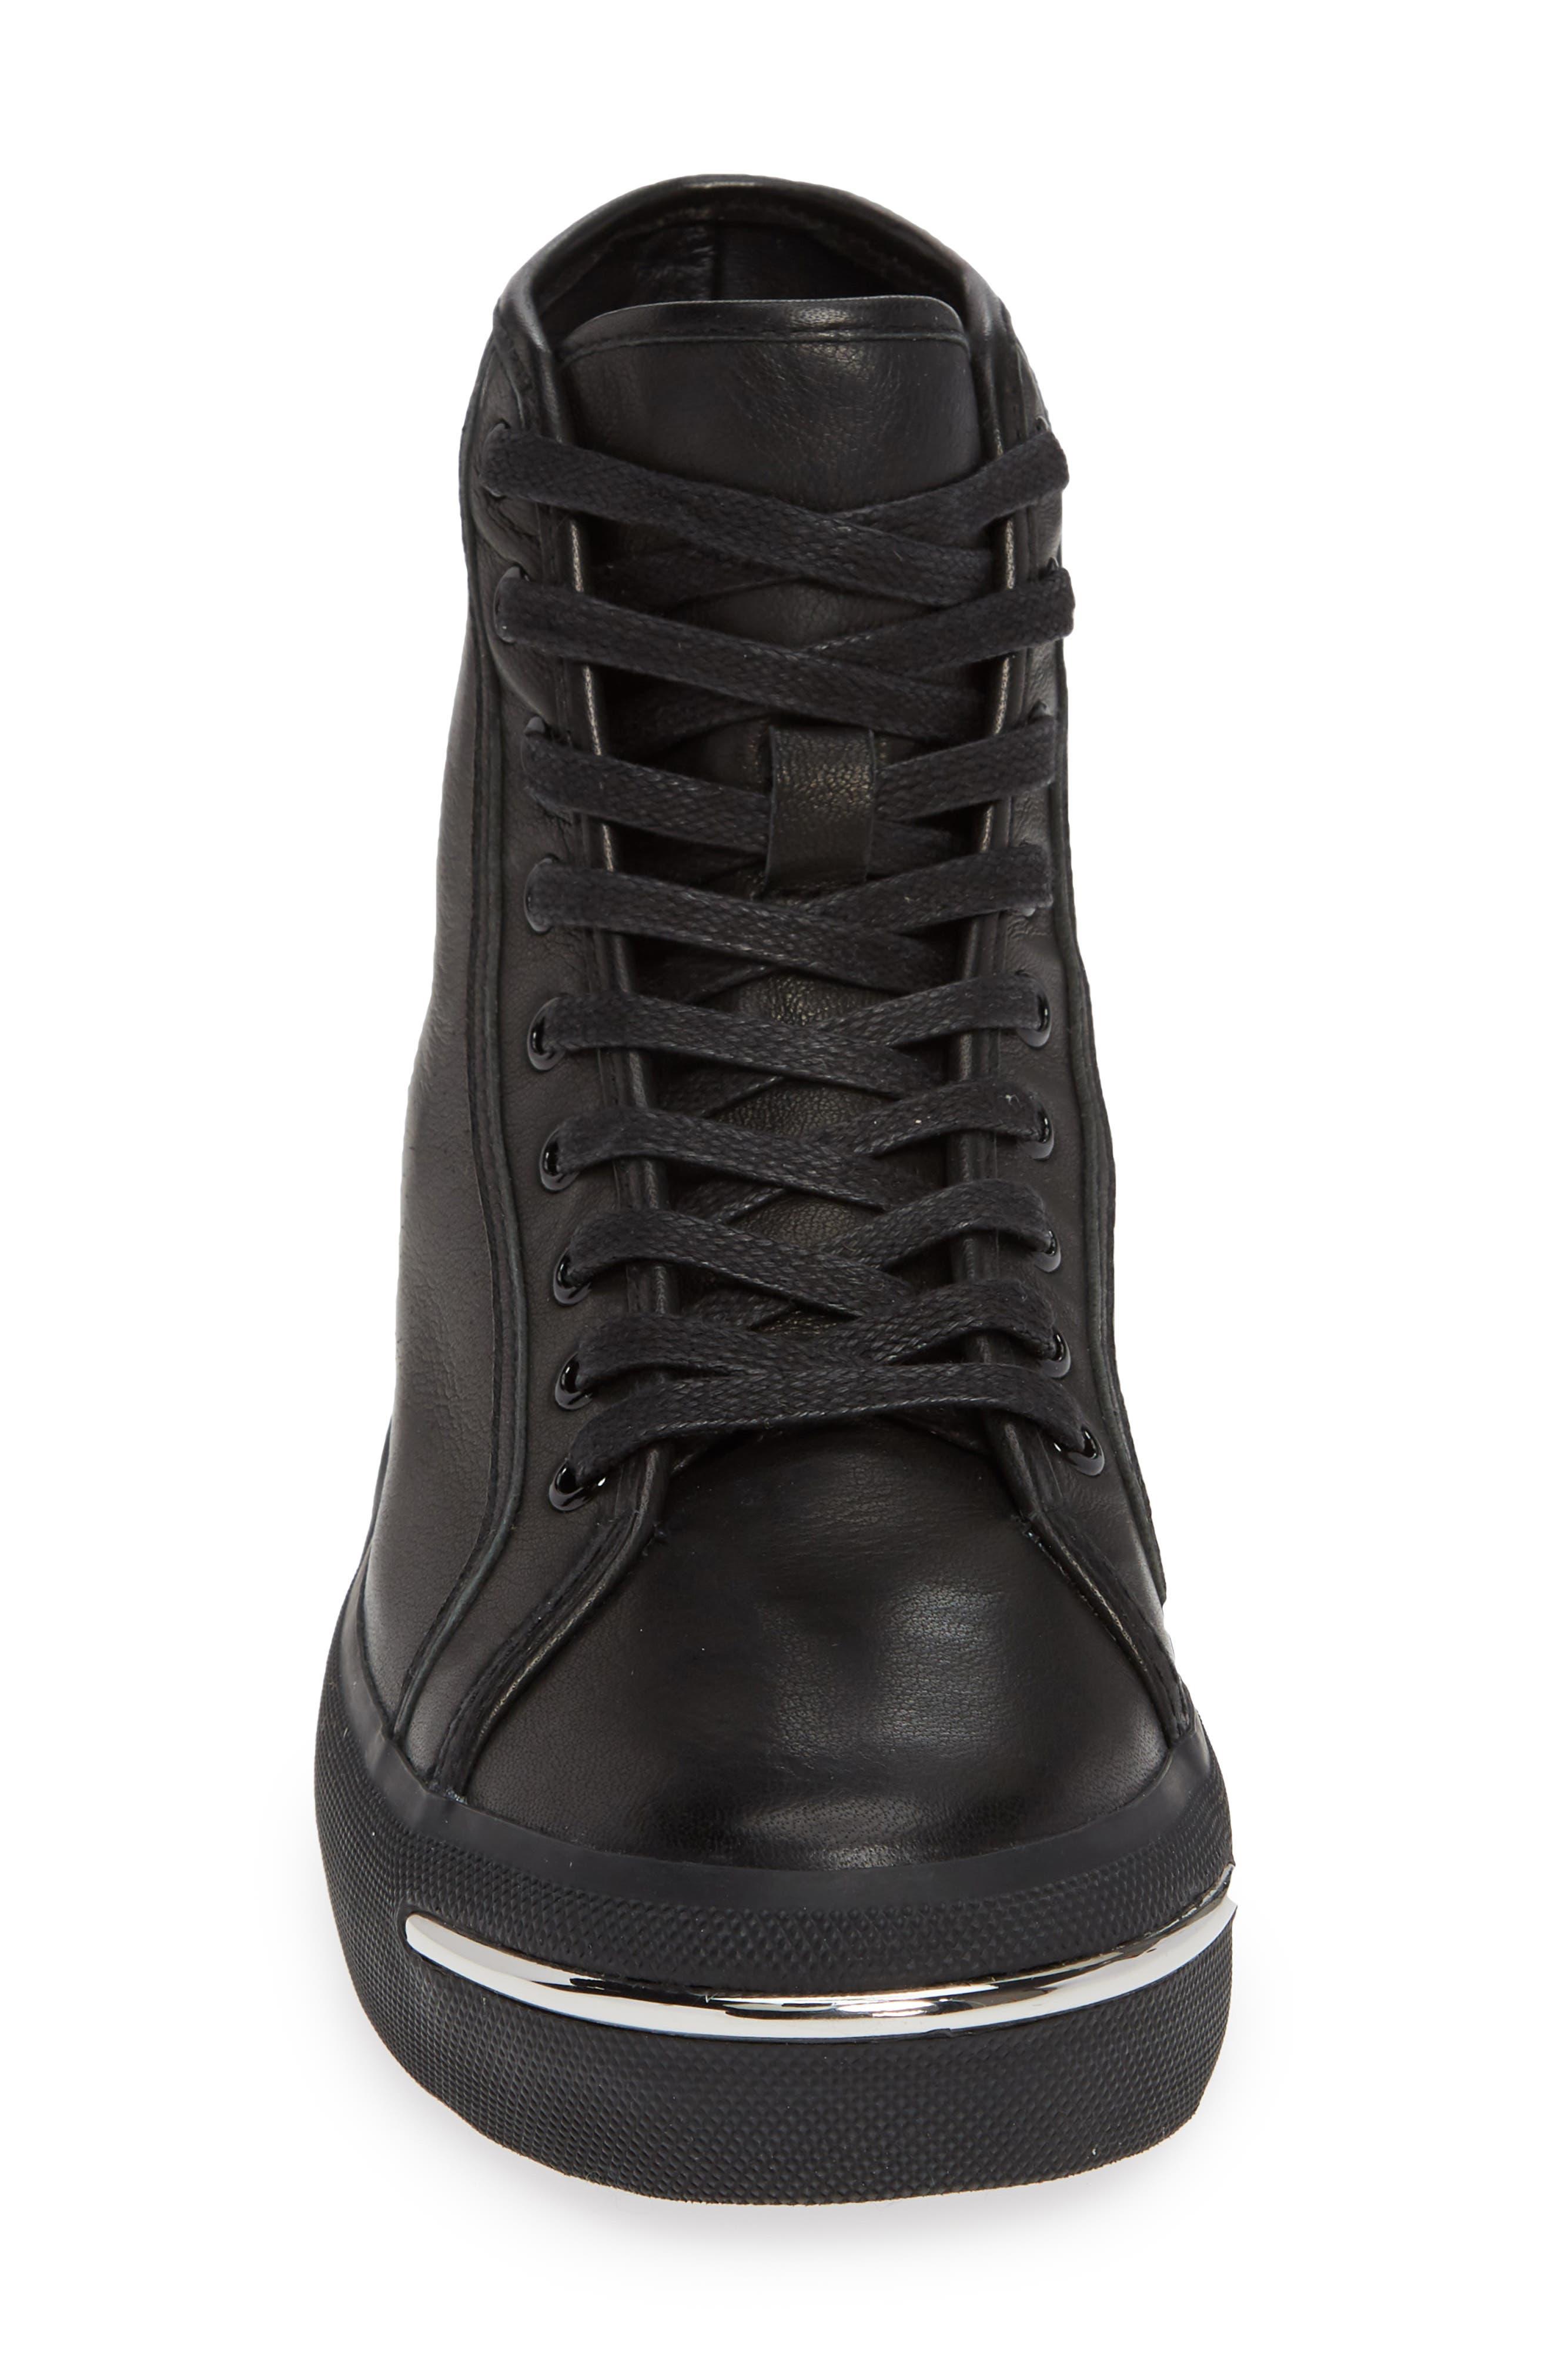 ALEXANDER WANG, Pia High Top Sneaker, Alternate thumbnail 4, color, BLACK